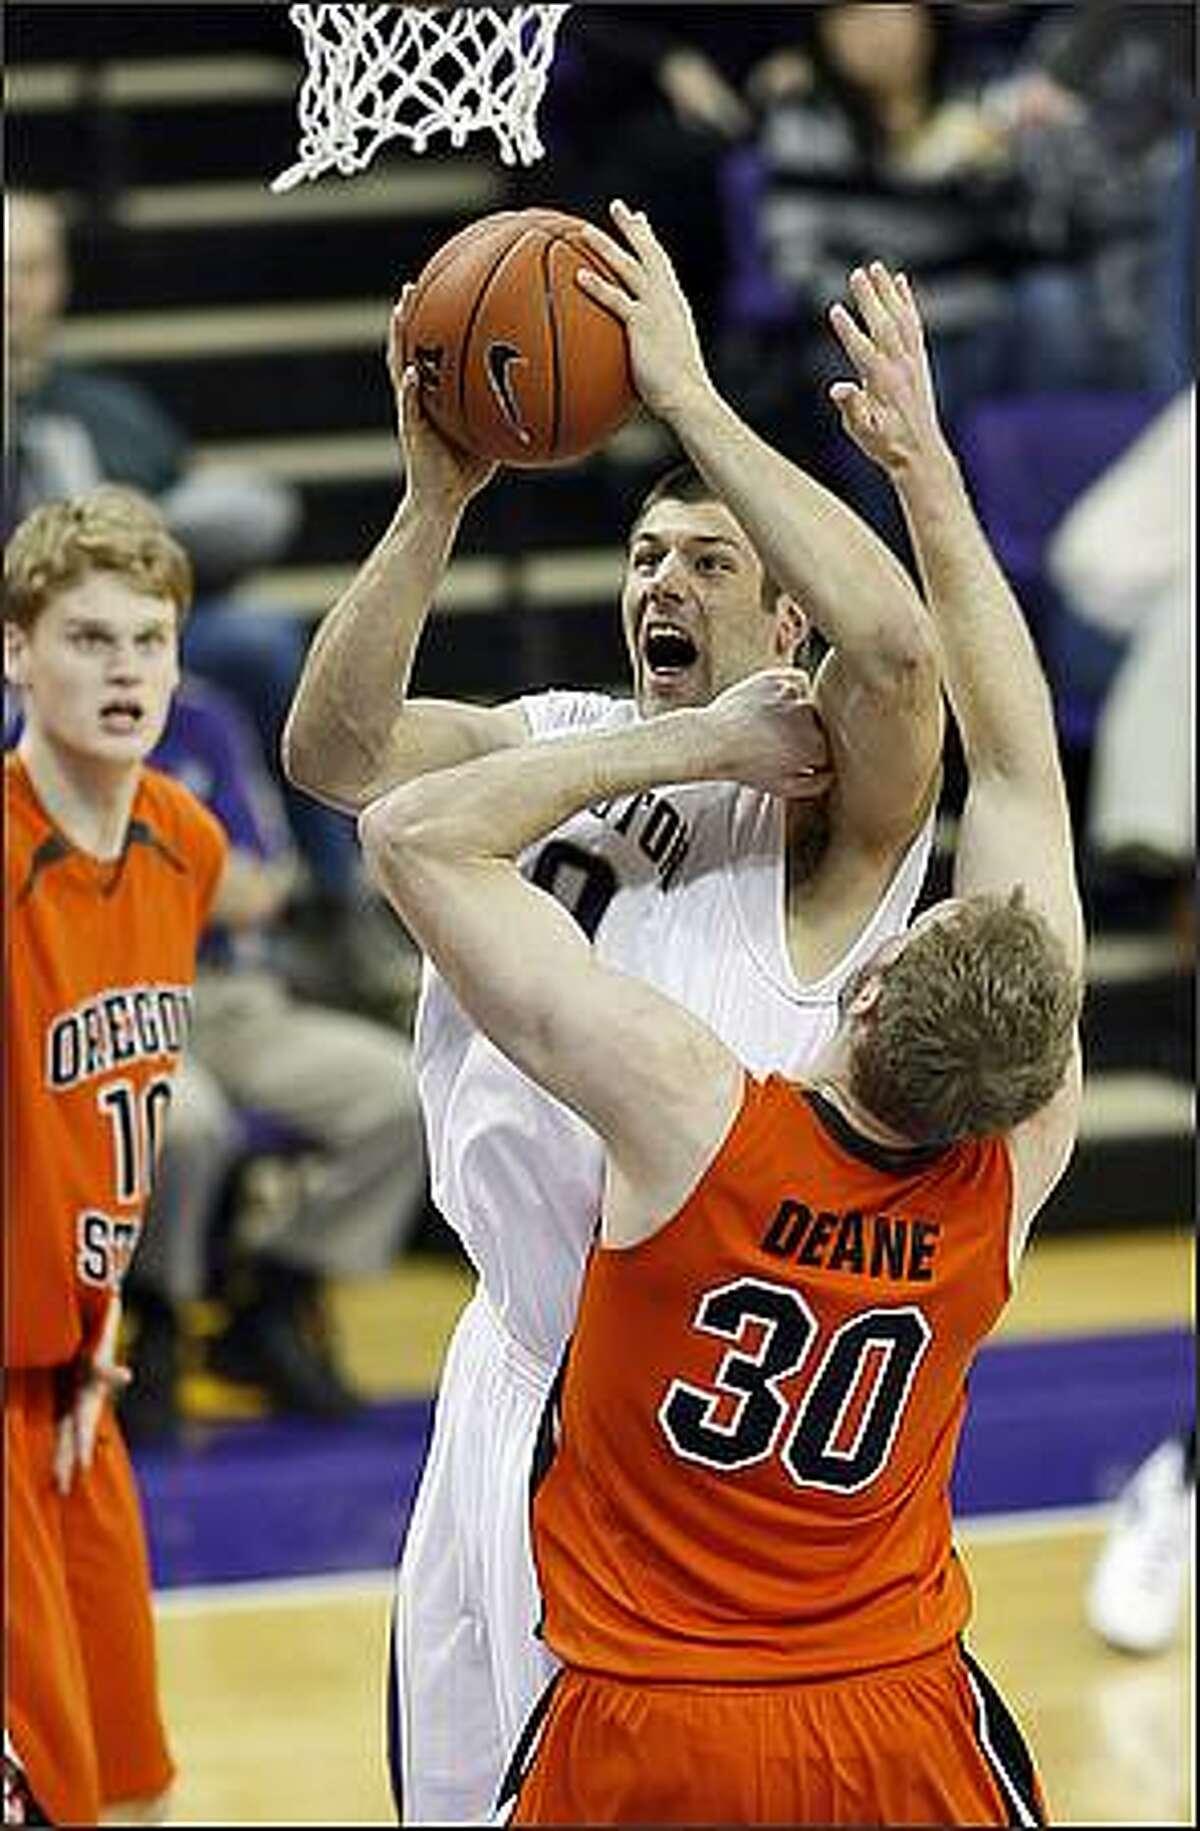 Washington Huskies Jon Brockman shoots over Oregon State Beavers Daniel Deane during first half action at the University of Washington.